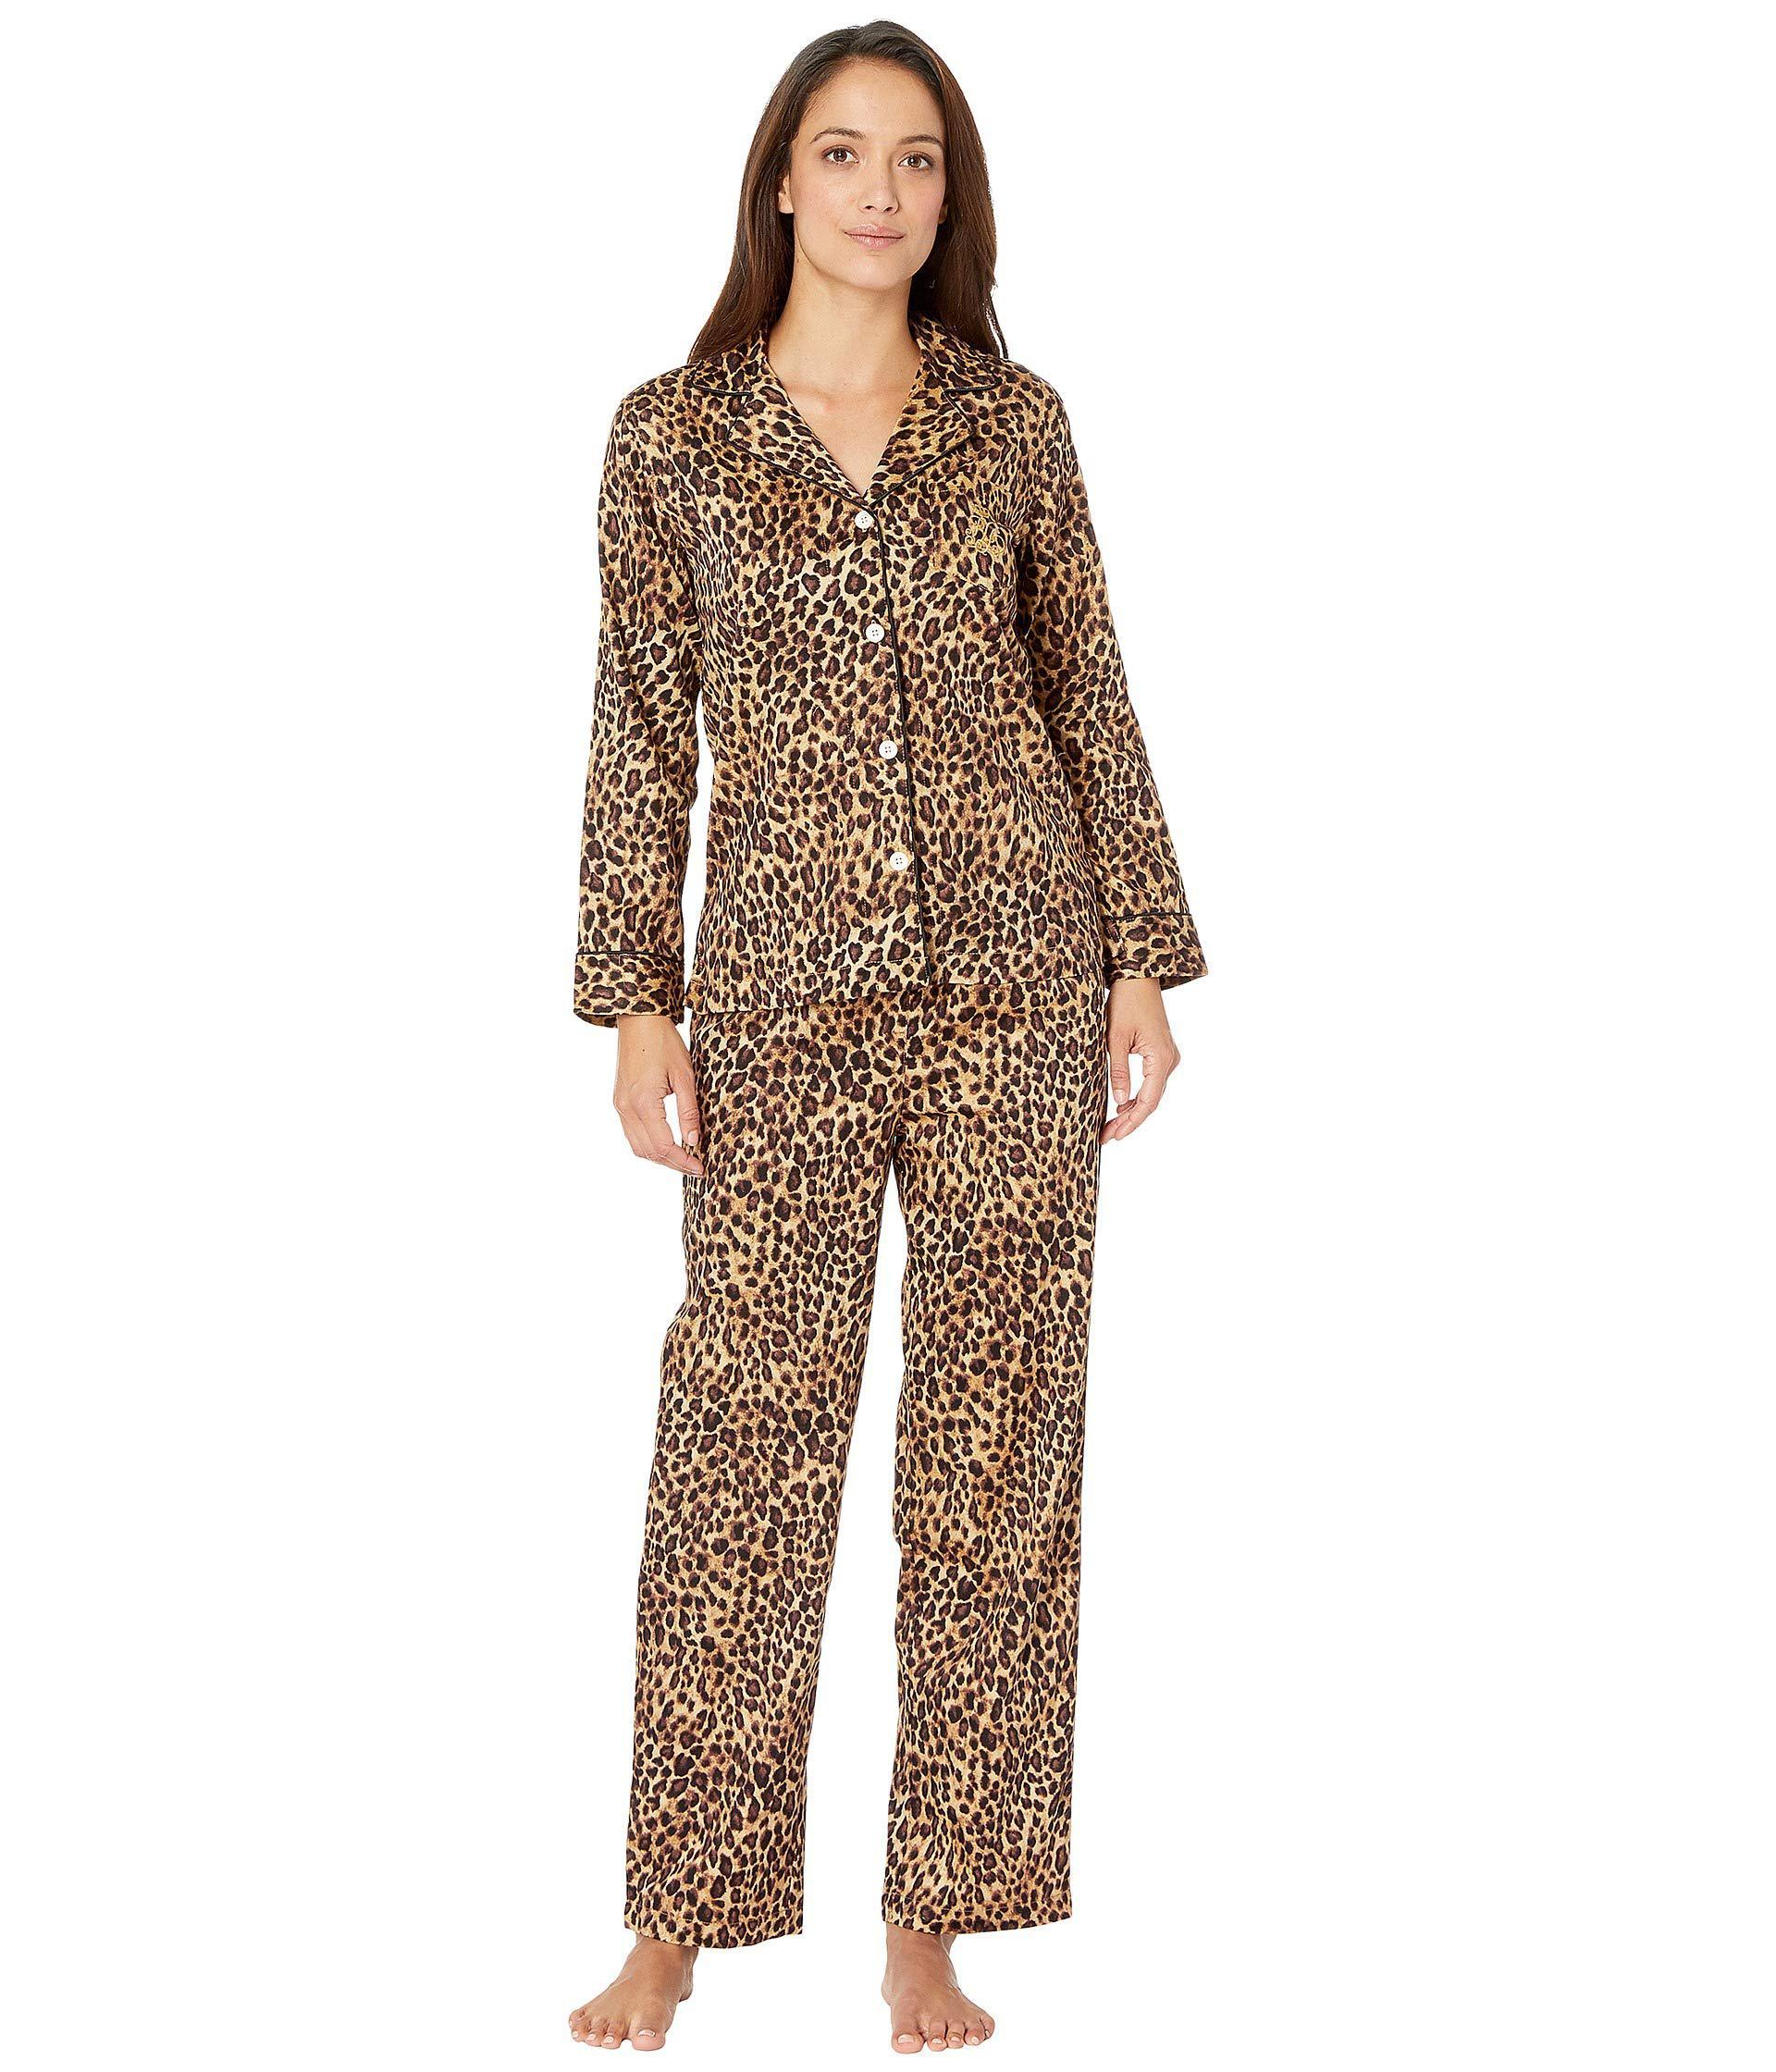 632c1c1b07 Lauren by Ralph Lauren. Brown Petite Sateen Long Sleeve Classic Notch  Collar Pajama Set (ivory Floral Print) ...